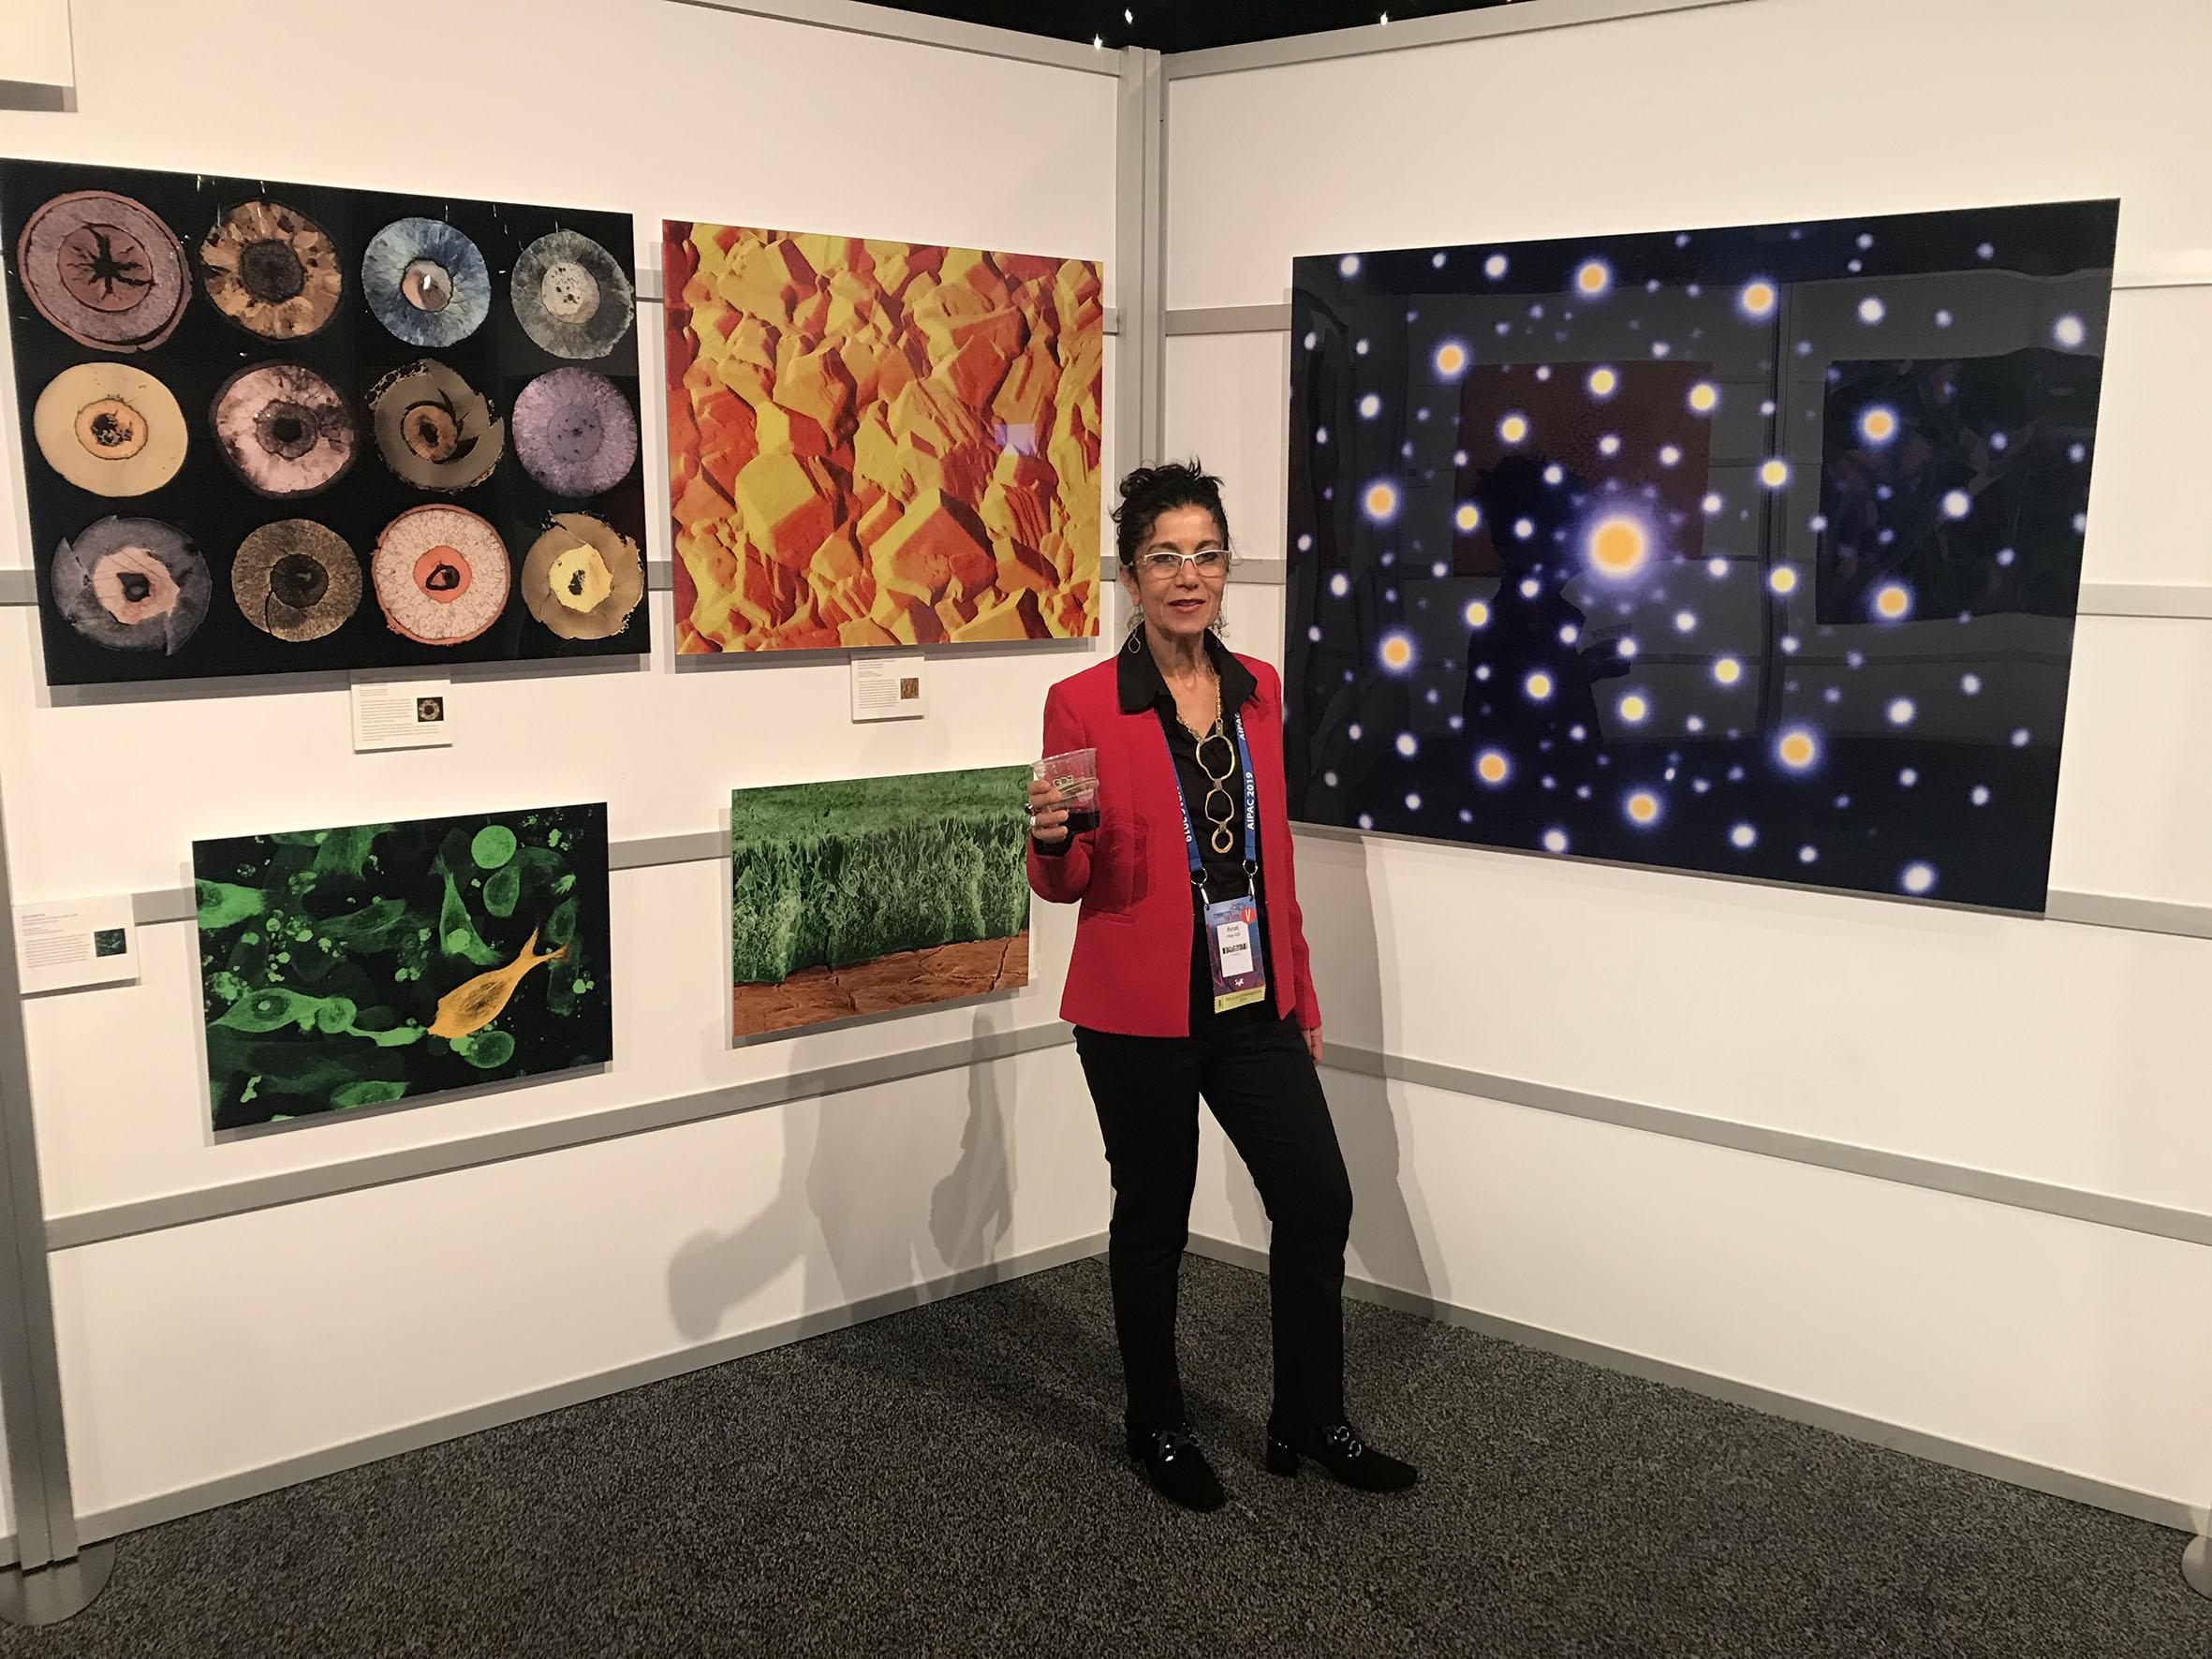 Z. Lovinger's work in the exhibition